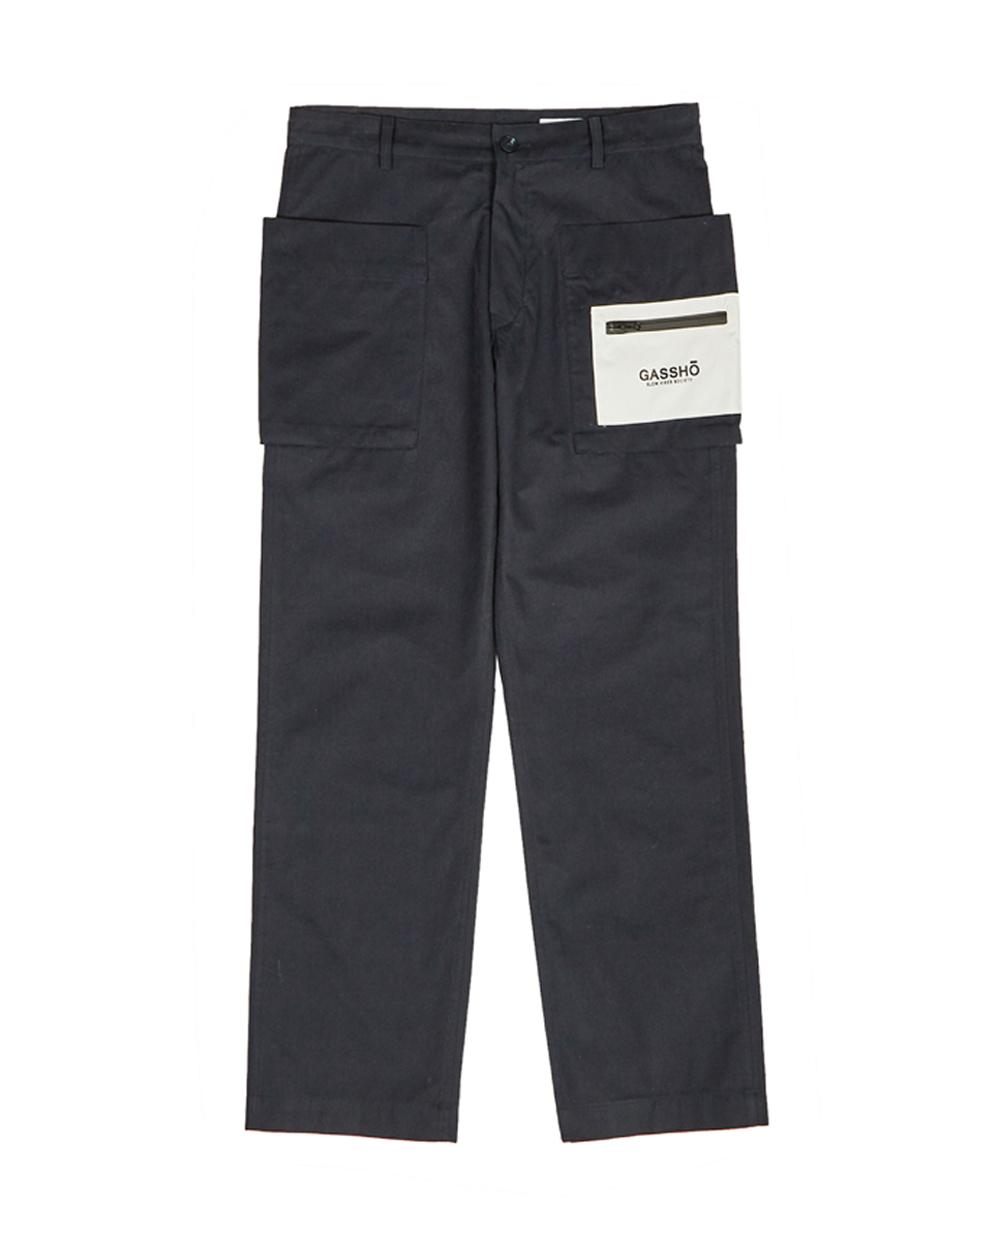 GASSHO POCKET PANTS